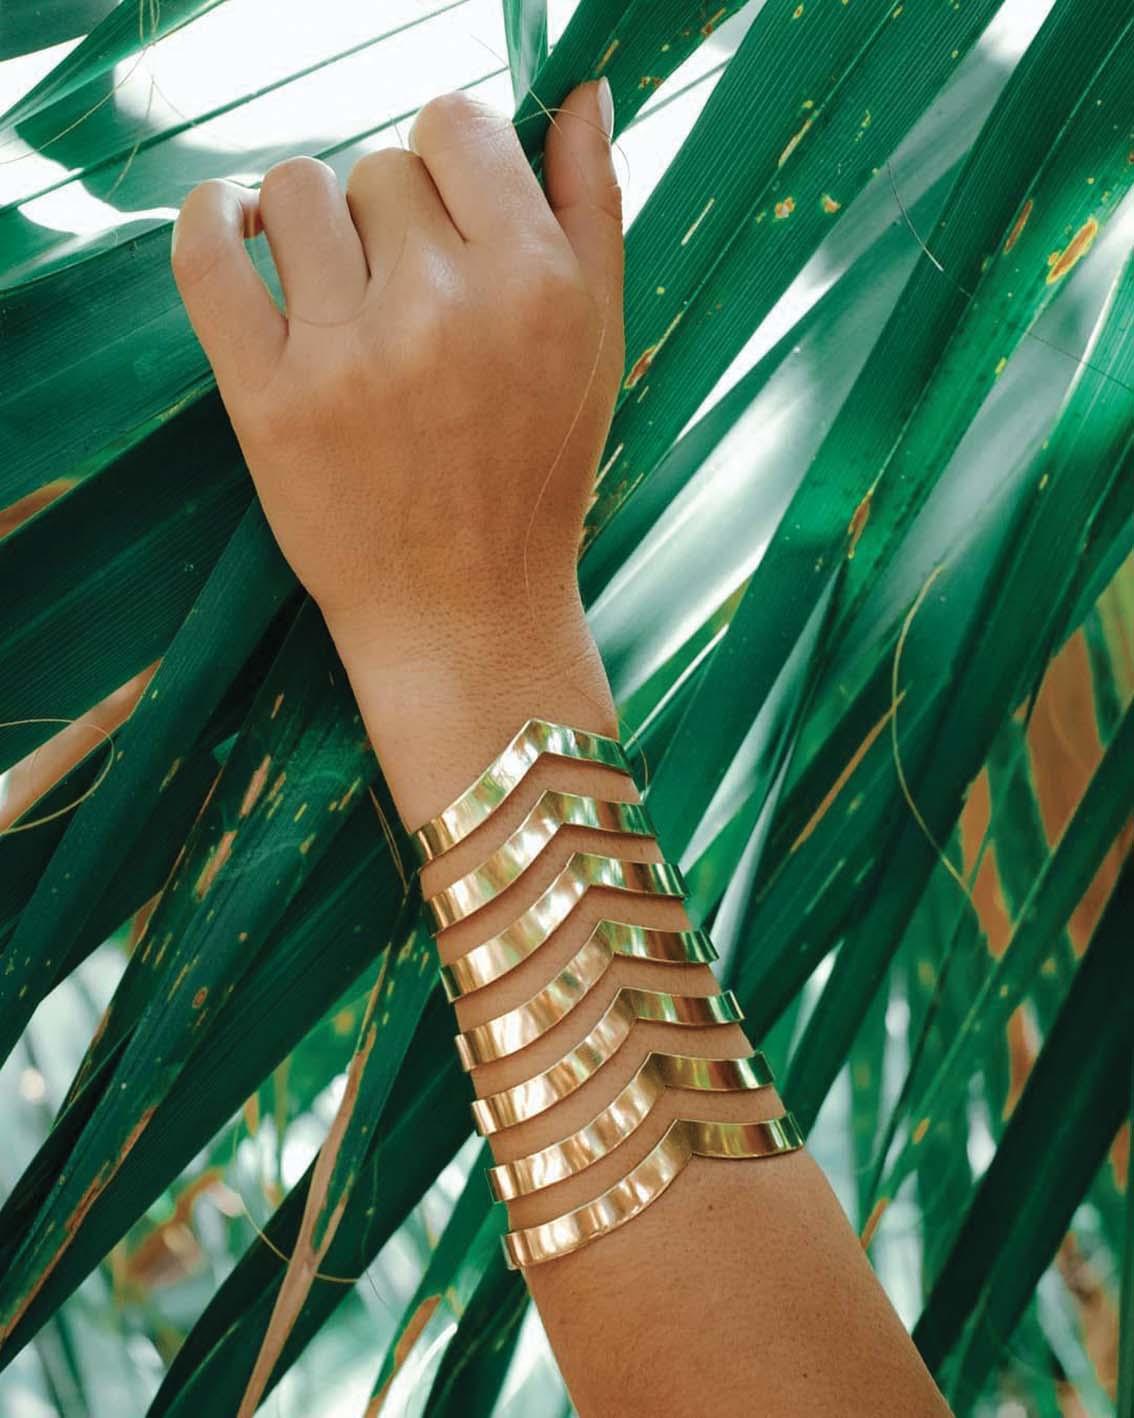 Kasha Bali, les bijoux  au supplément d'âme  de Kenza Barrada